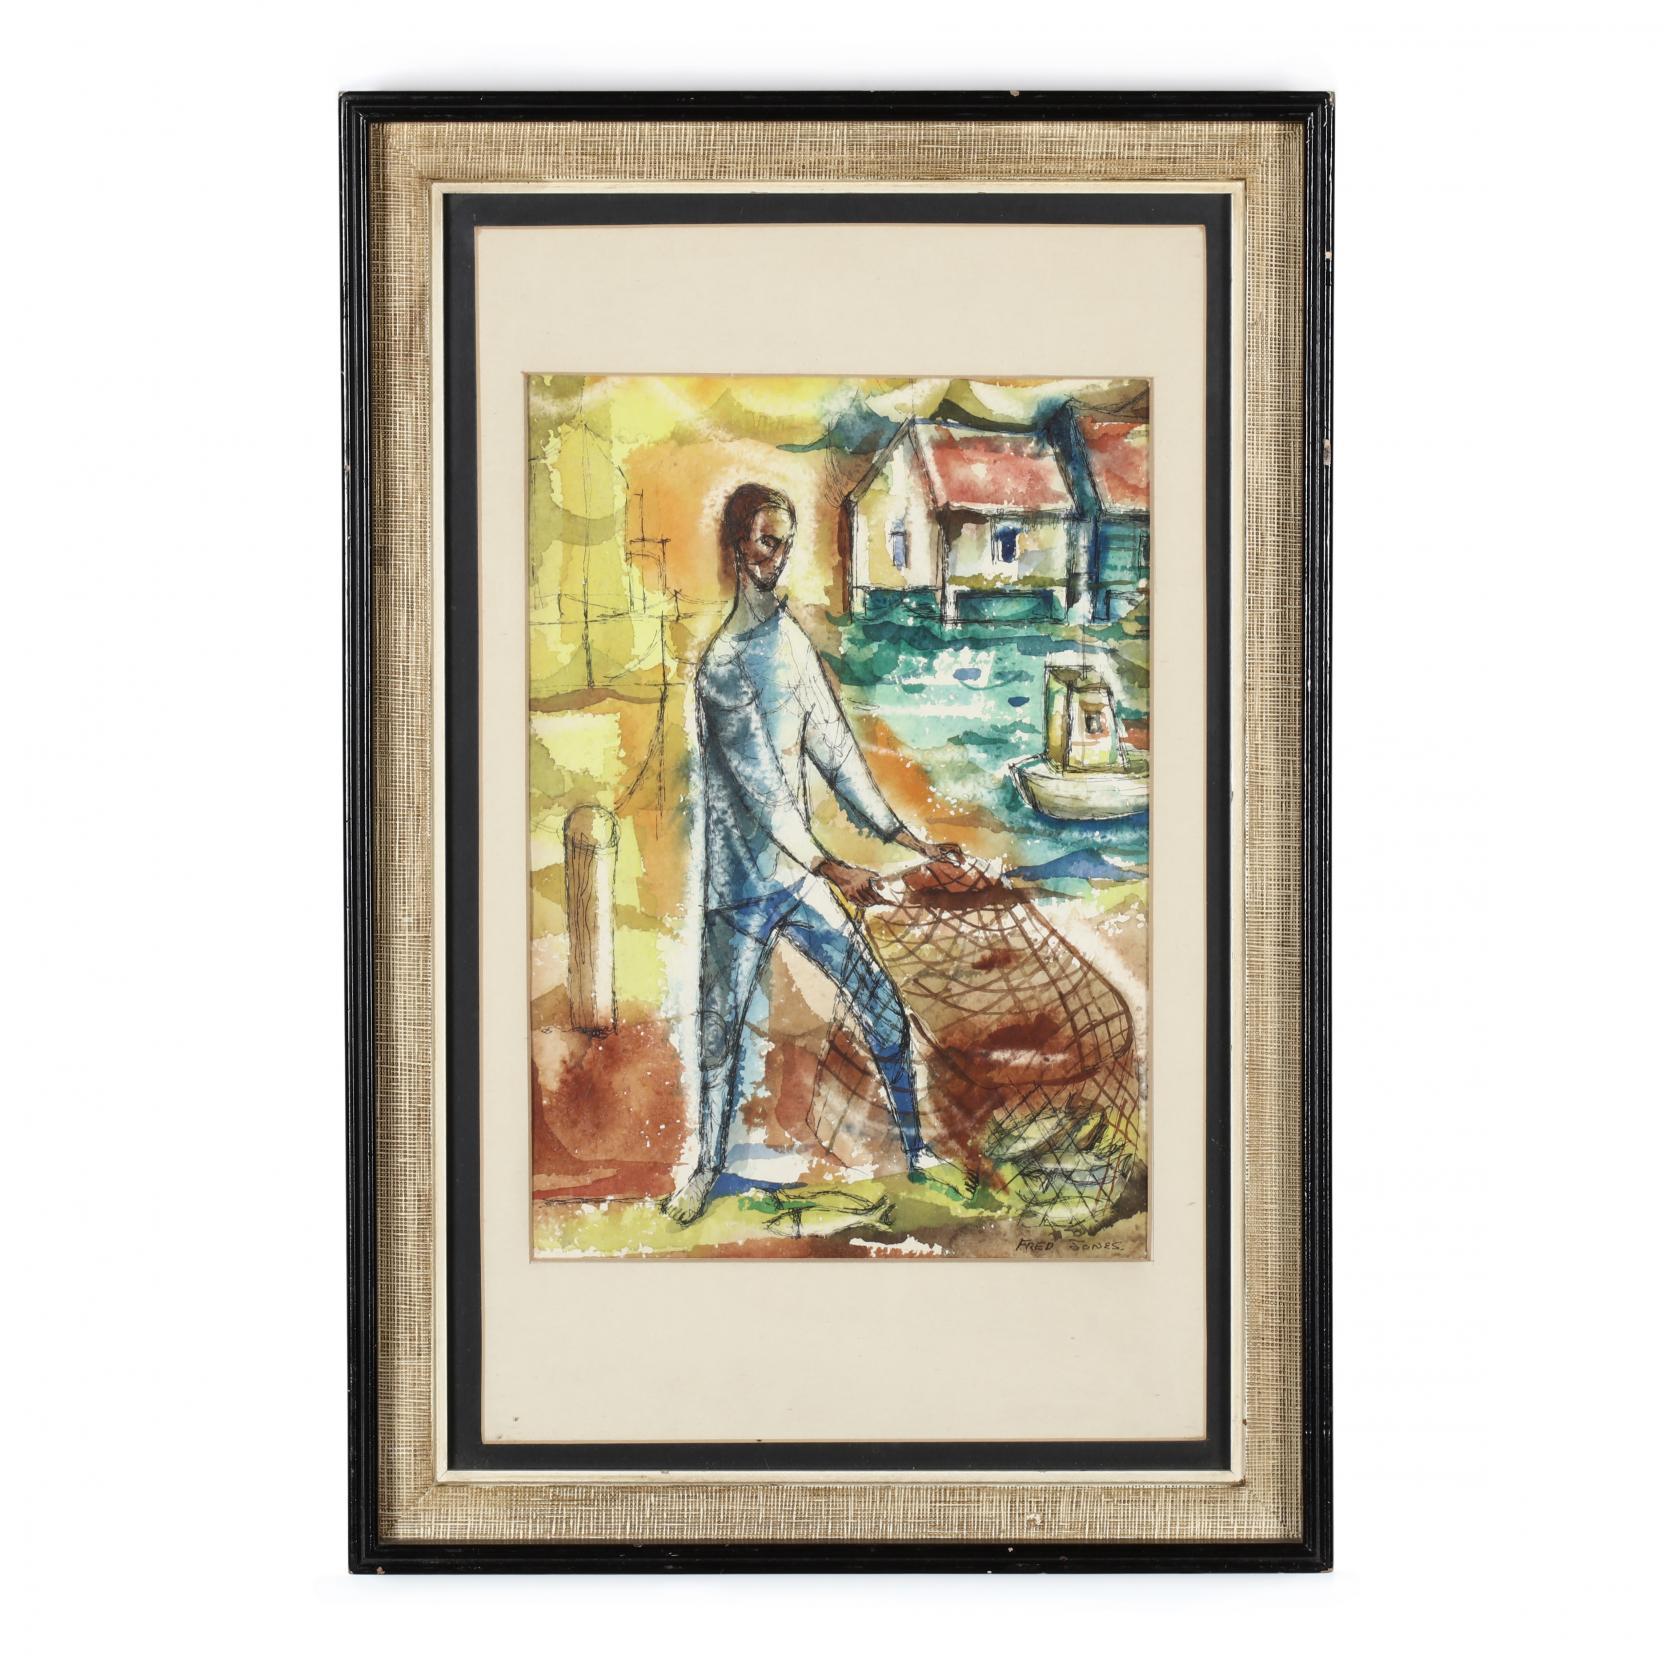 frederick-d-fred-jones-american-1914-1996-a-fisherman